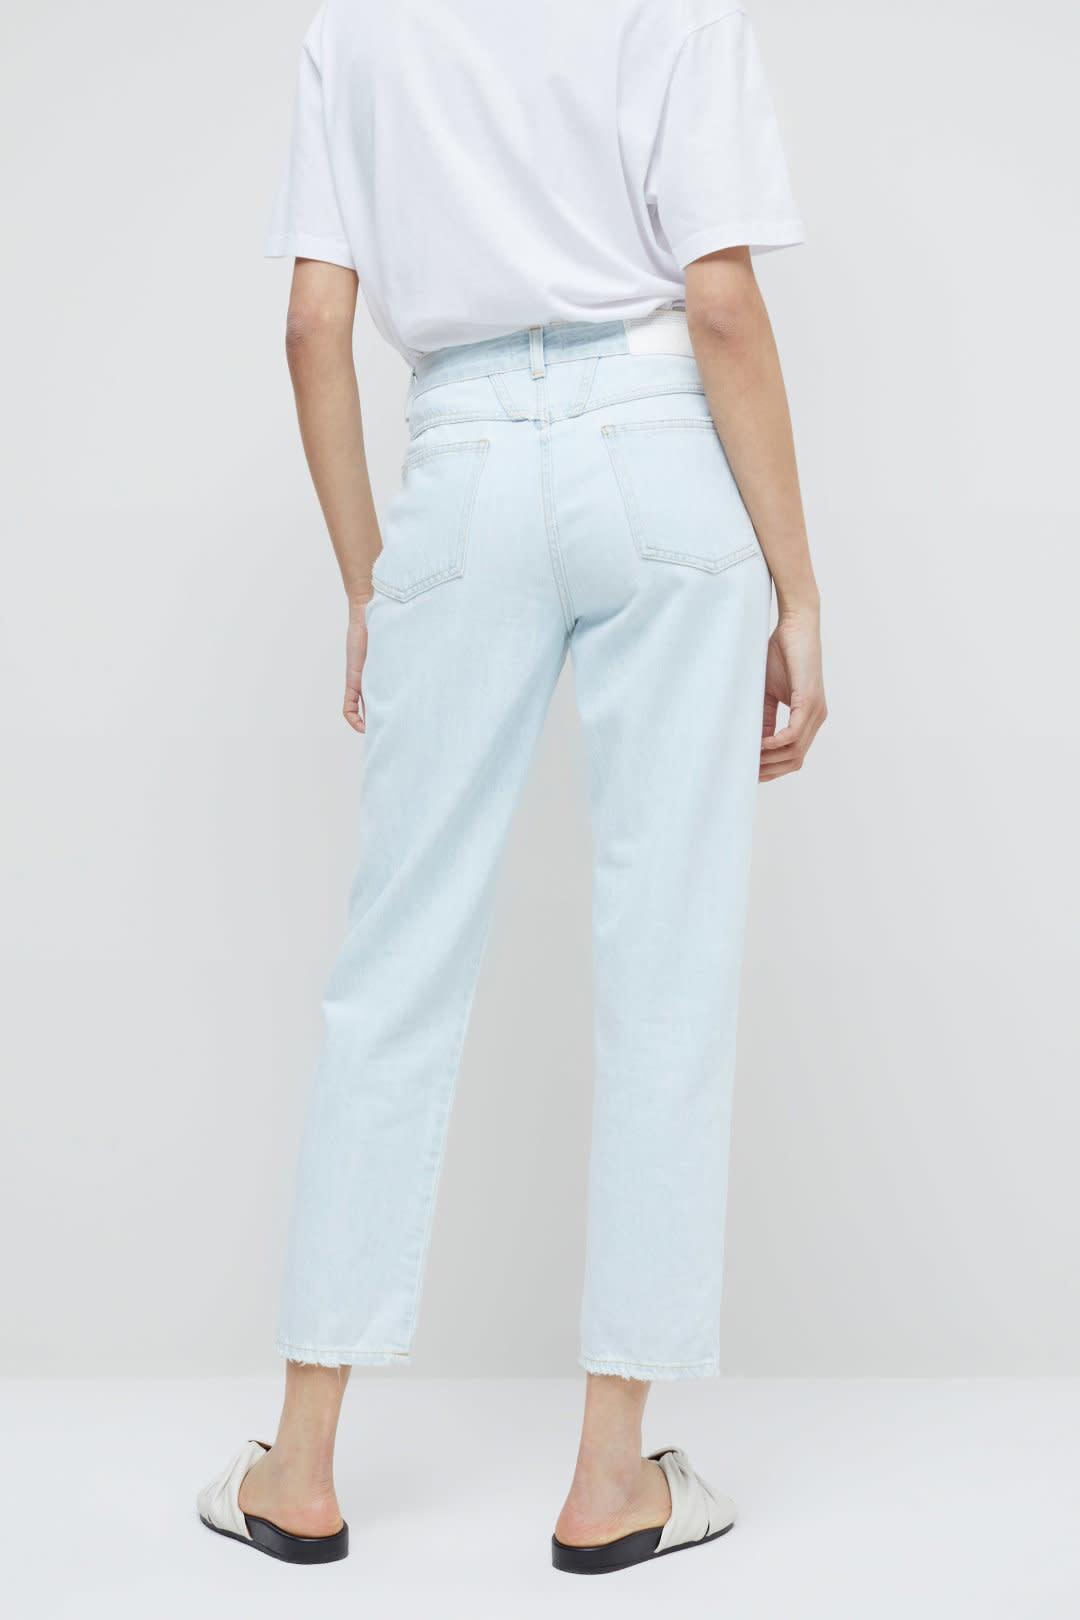 Pedal Pusher Jeans - Light Blue-2